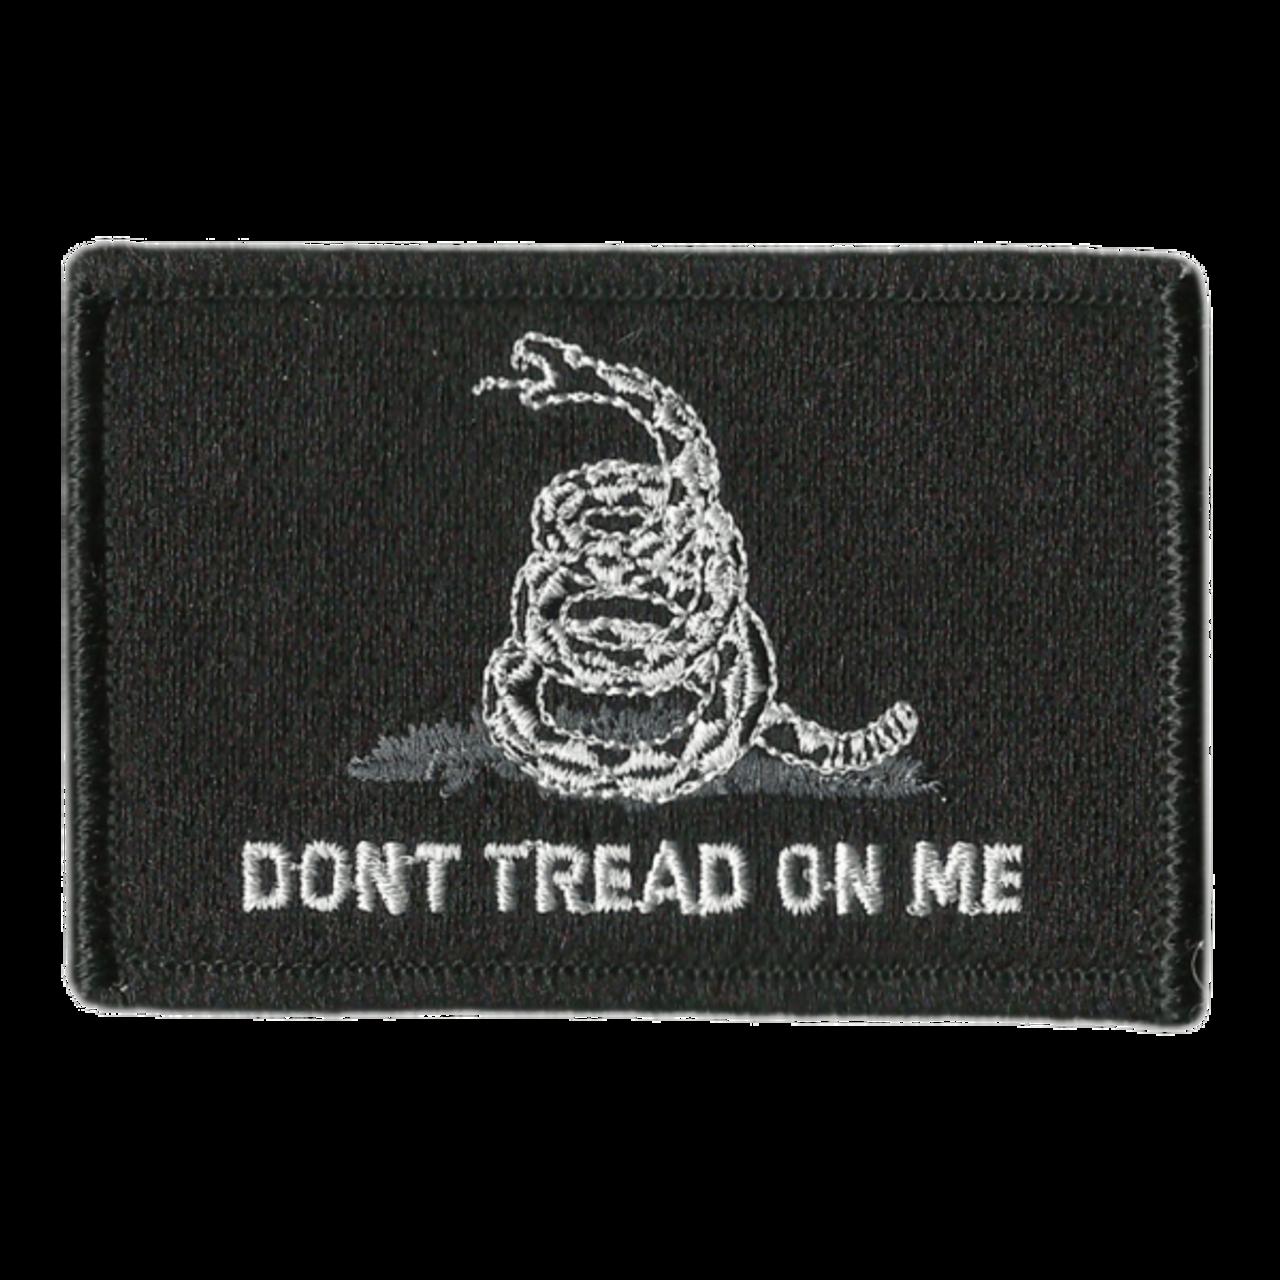 Black Gadsden Tactical Patch